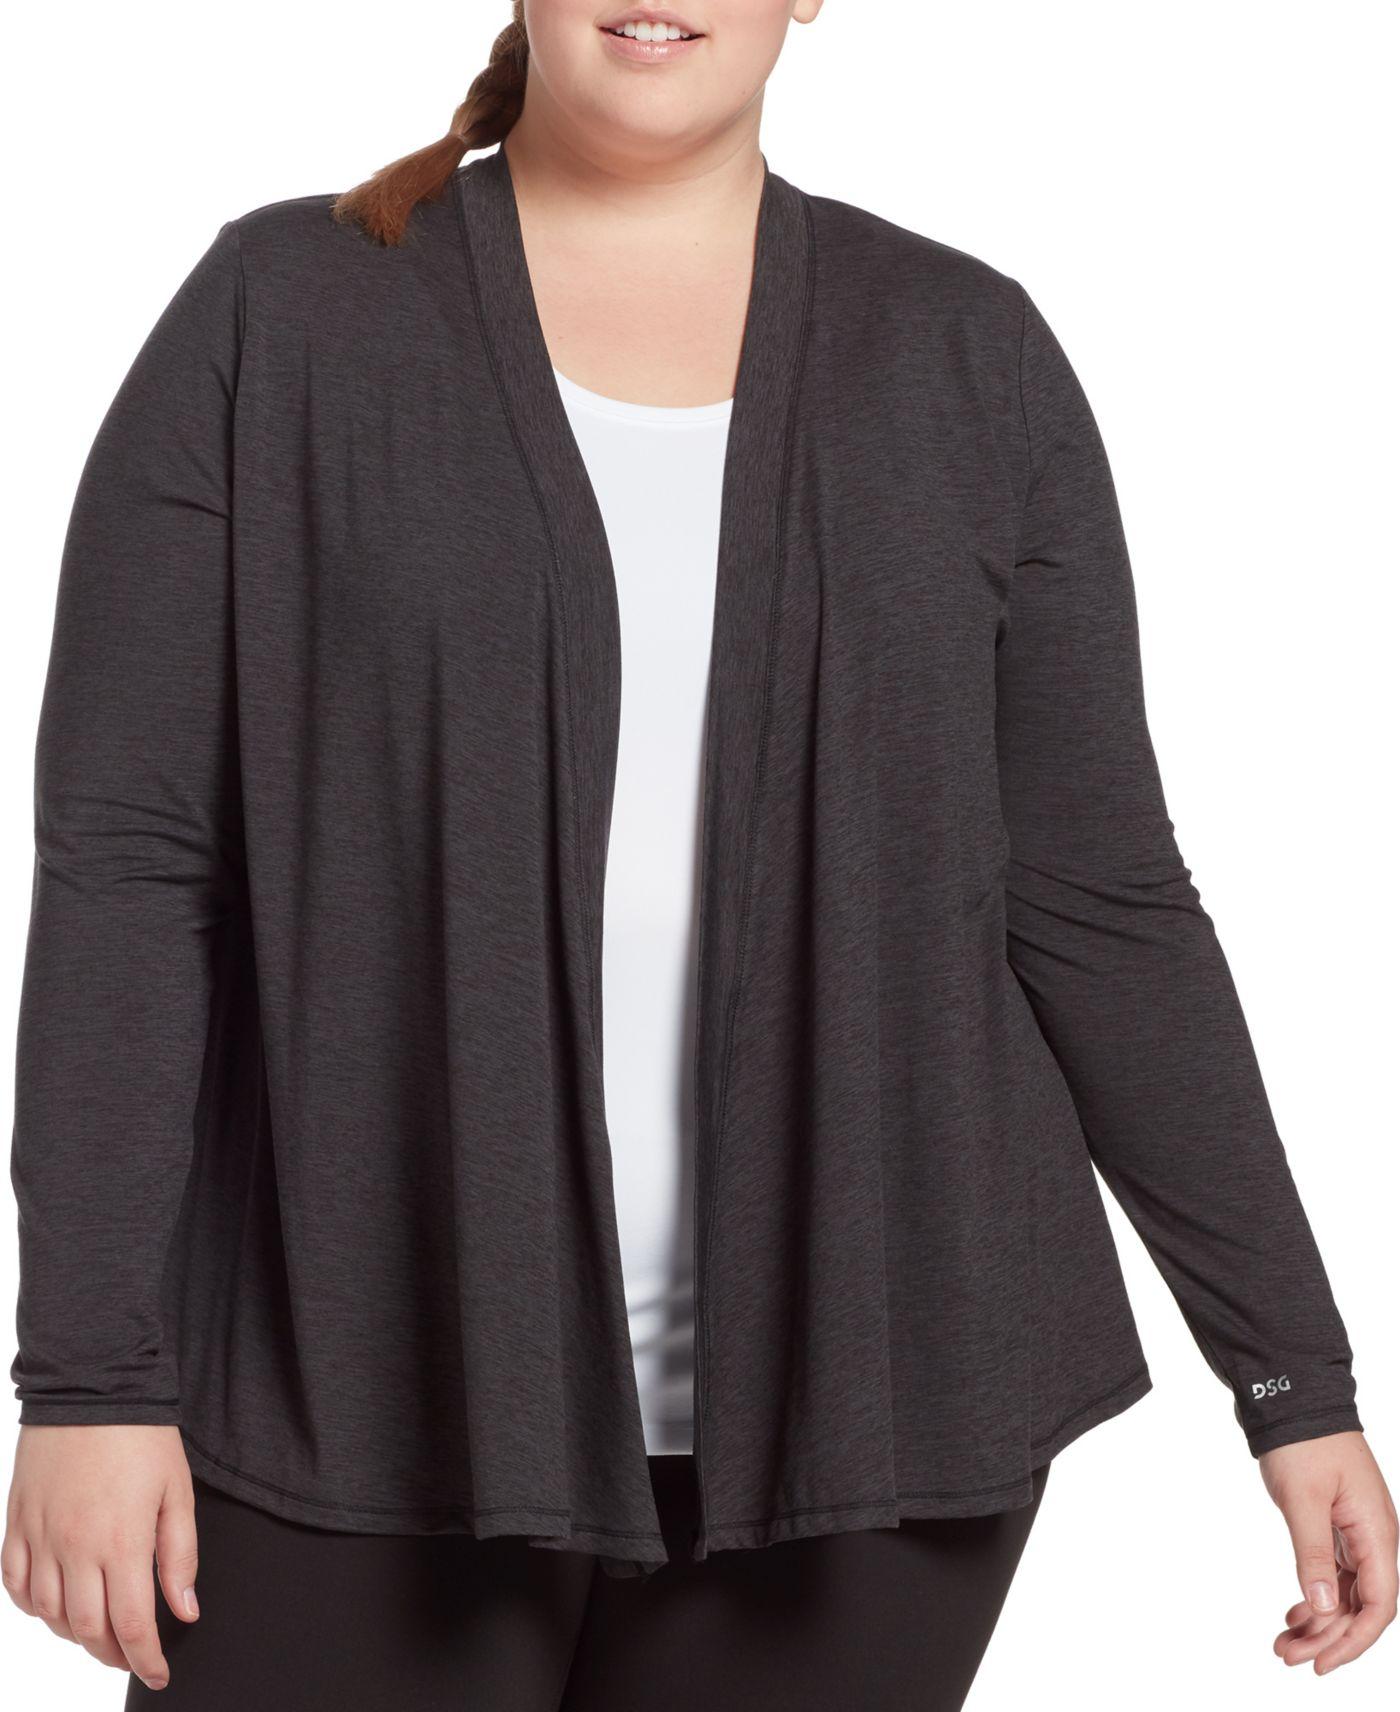 DSG Women's Plus Size Everyday Cardigan